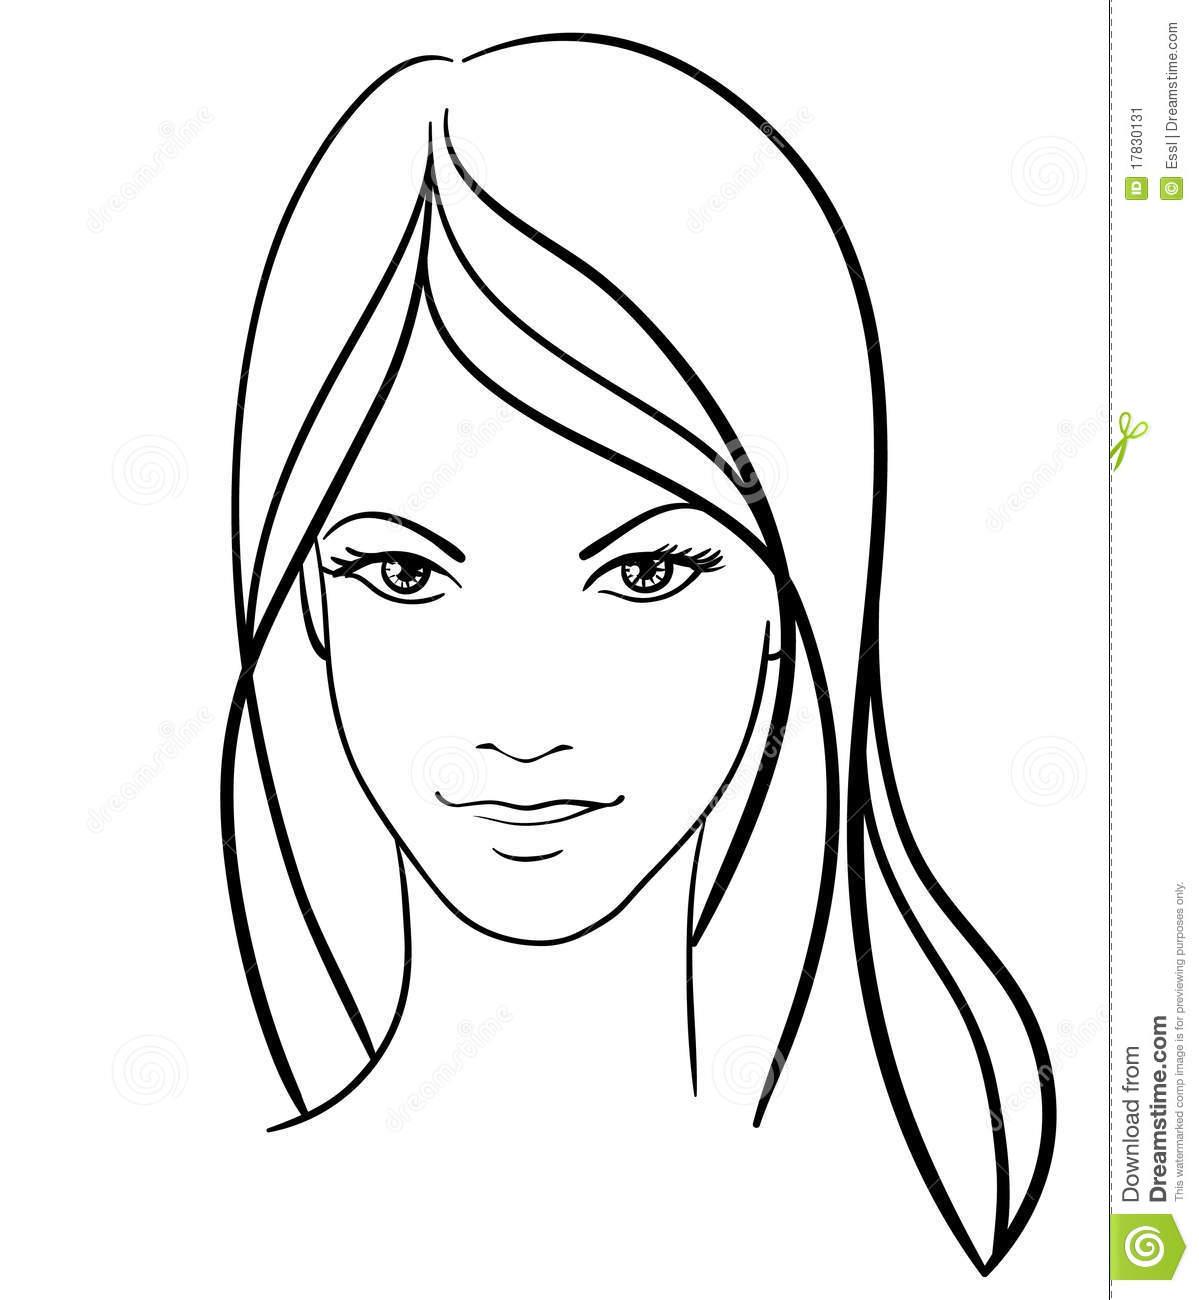 1199x1300 Nice Simple Girl Drawings Cute Girlkushalmittall